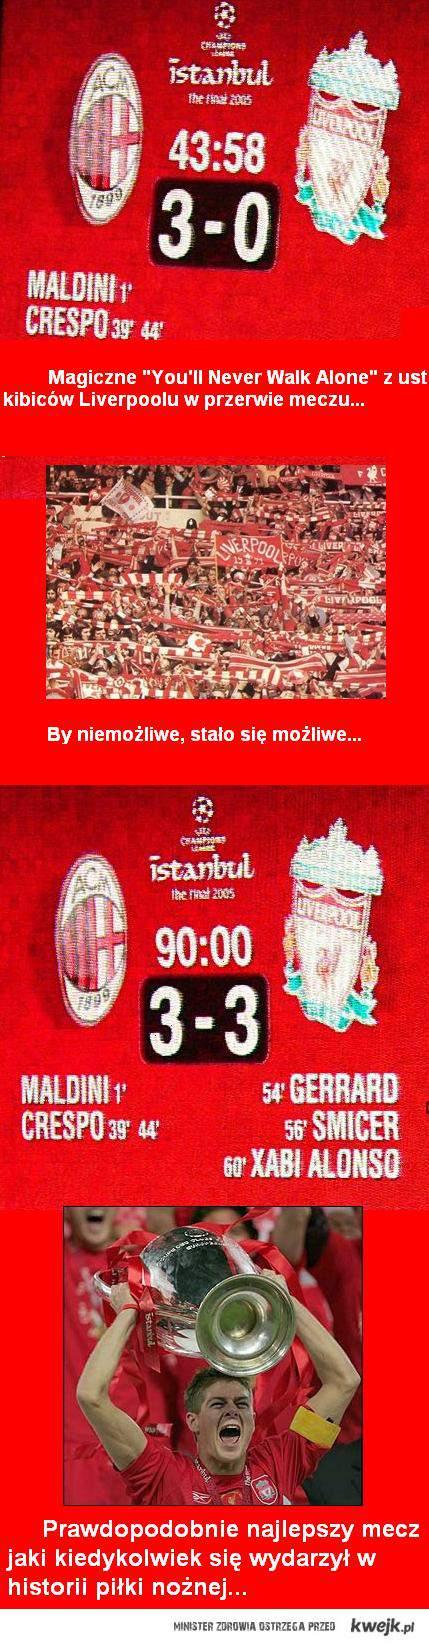 Liverpool magic istambul